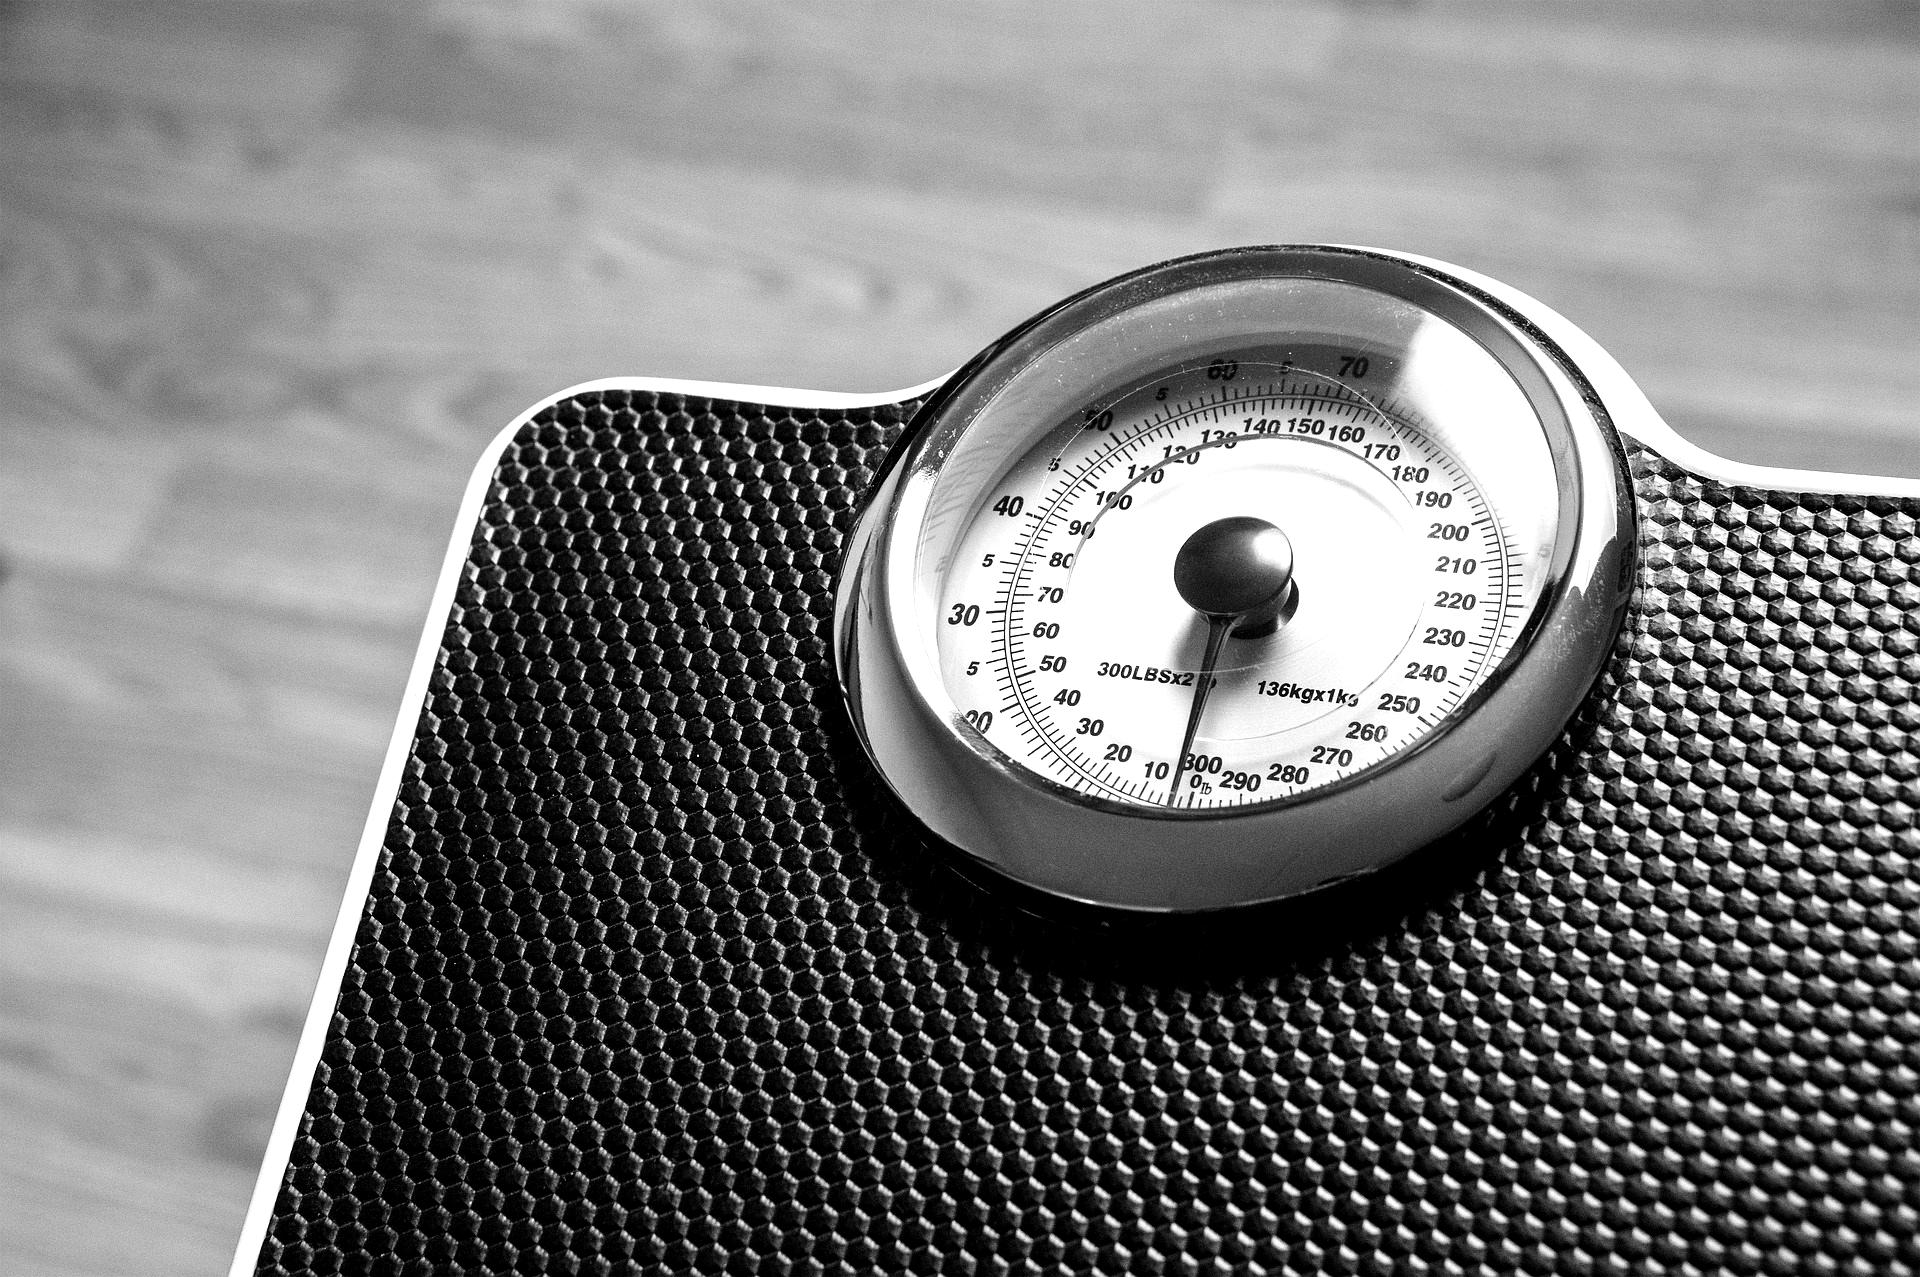 Understanding Bodyweight and Glycogen Depletion